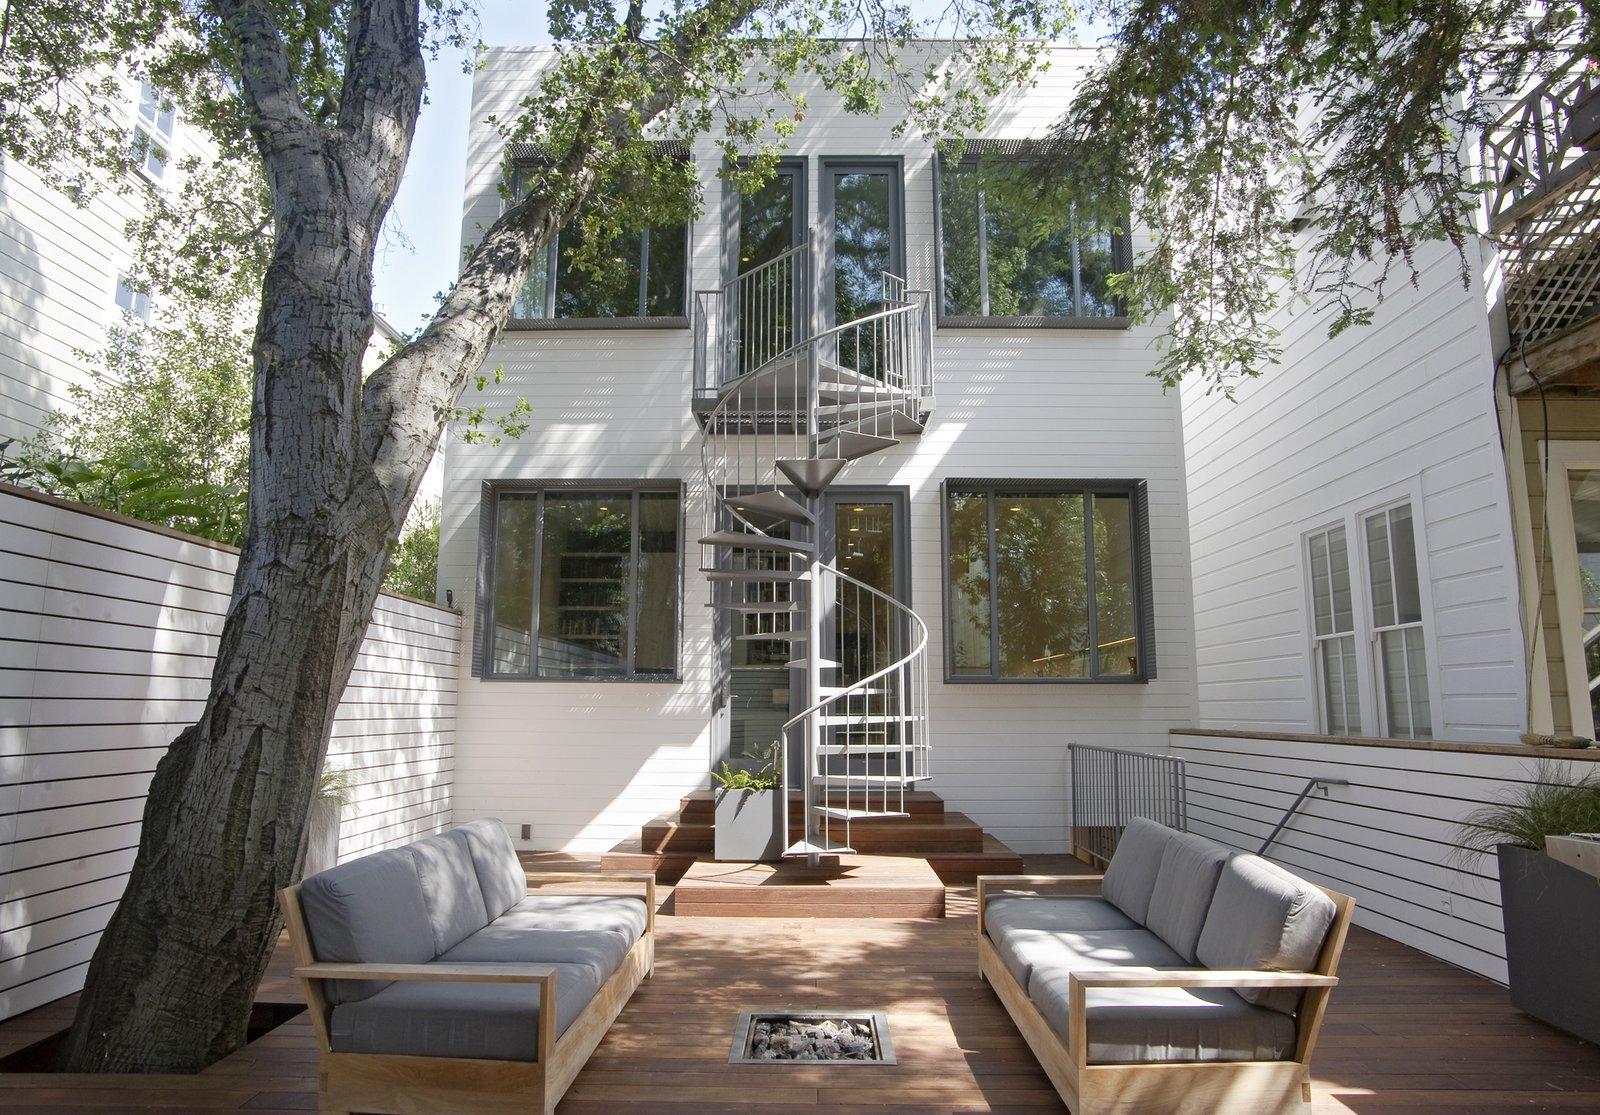 35 Liberty by Todd Davis Architecture